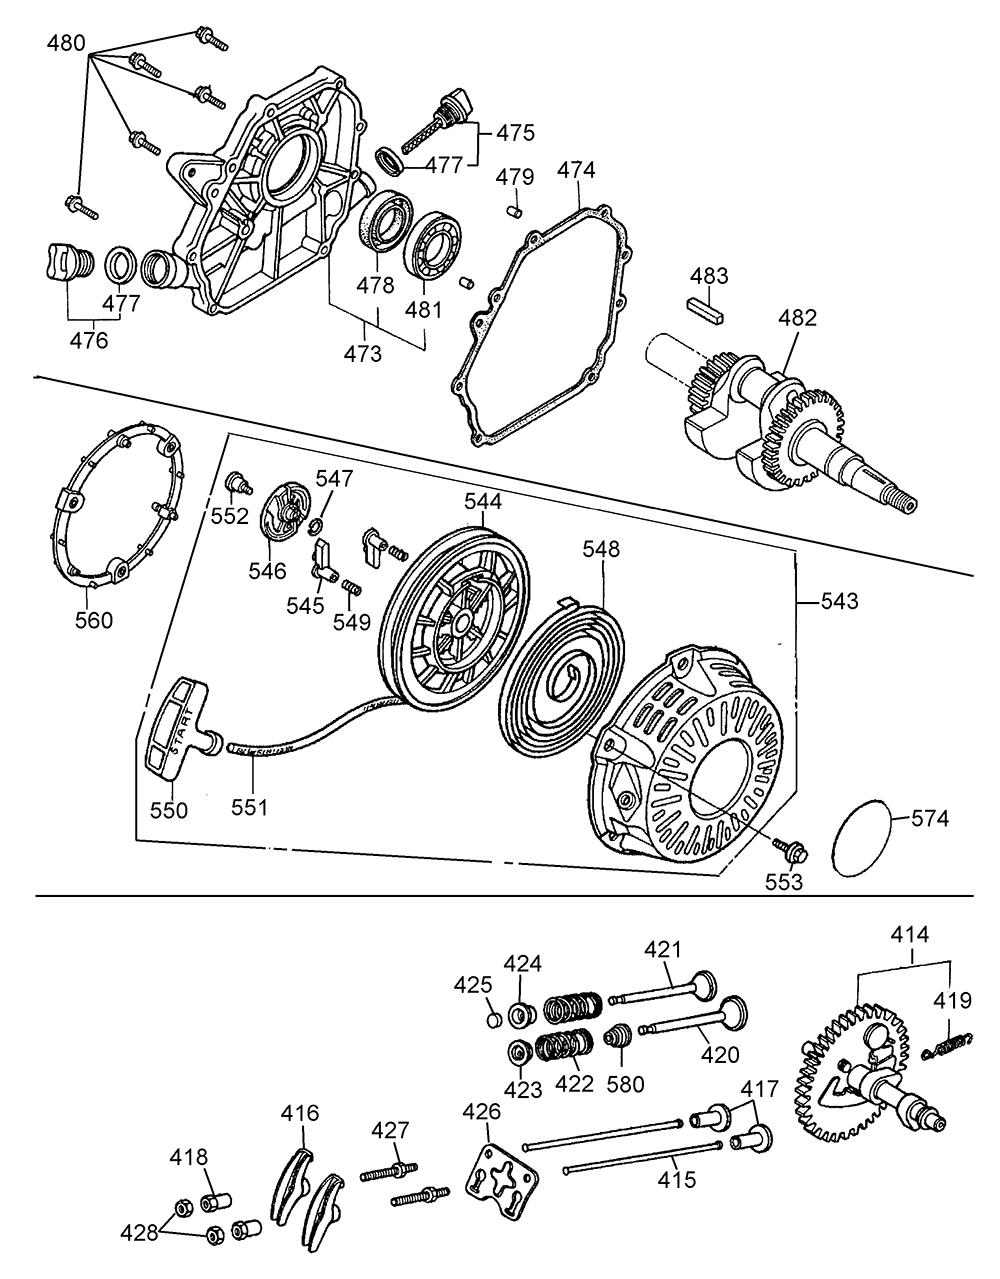 DP3100IC-Dewalt-T2-PB-2Break Down